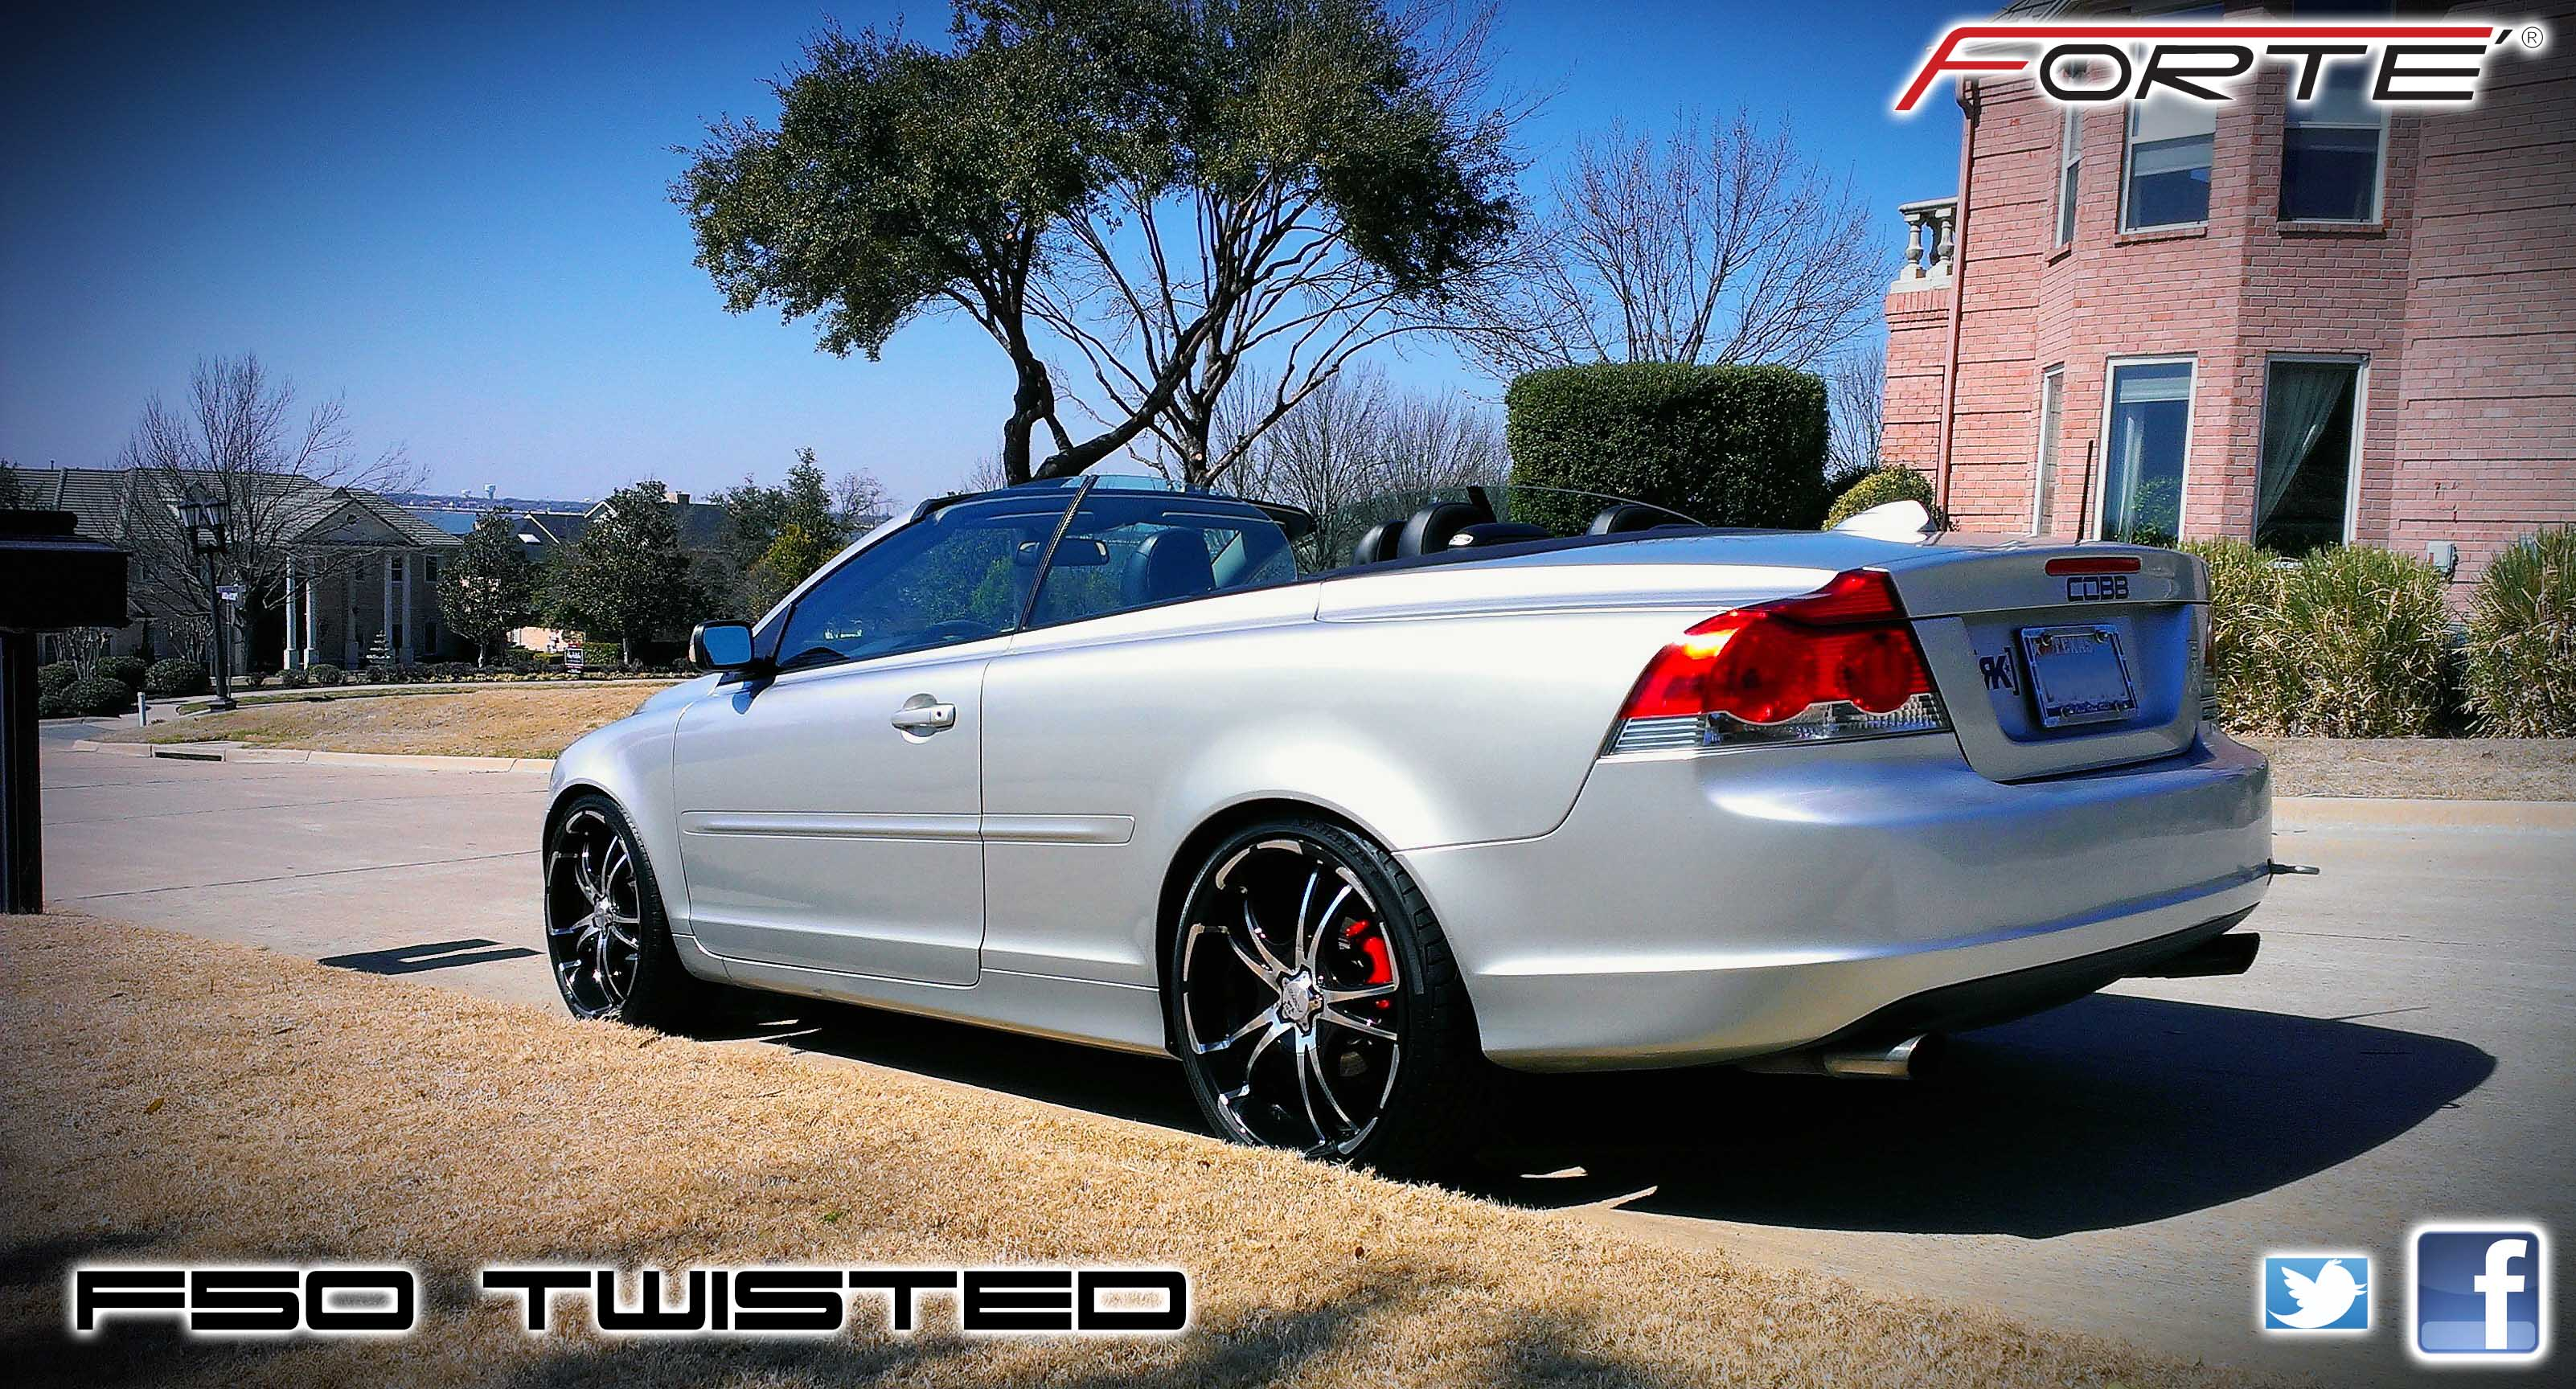 F50 Twisted Forte Wheels